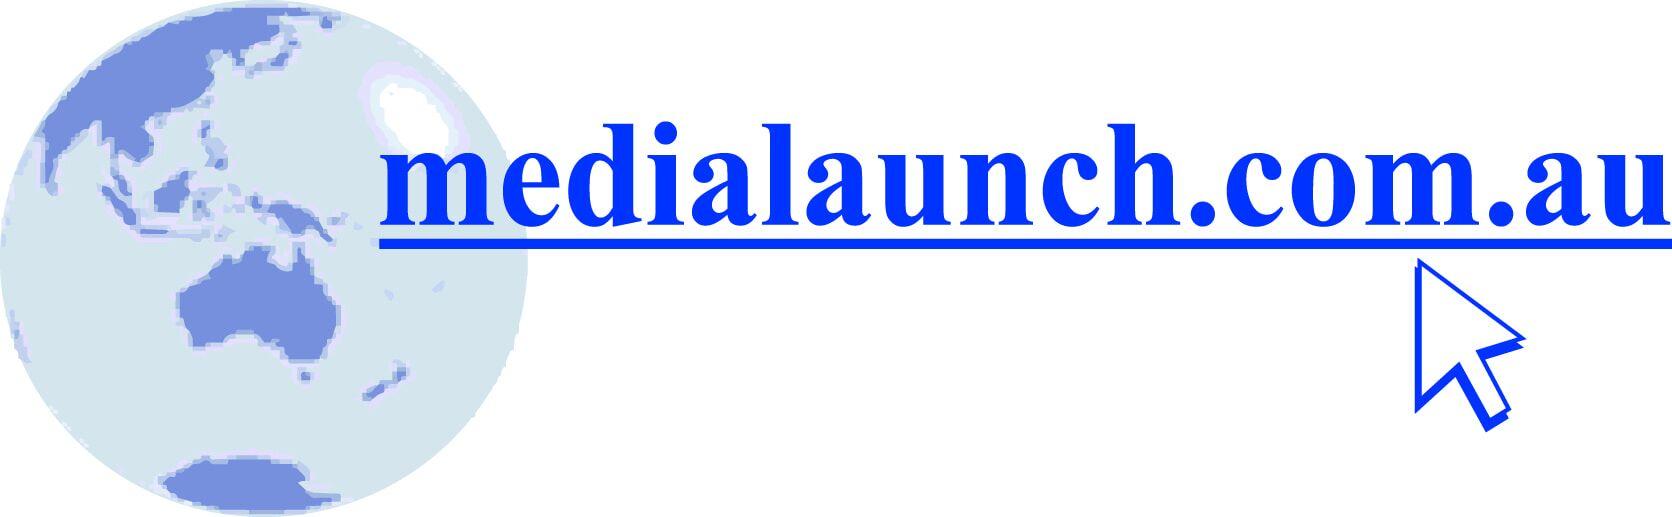 medialaunch logo 1998